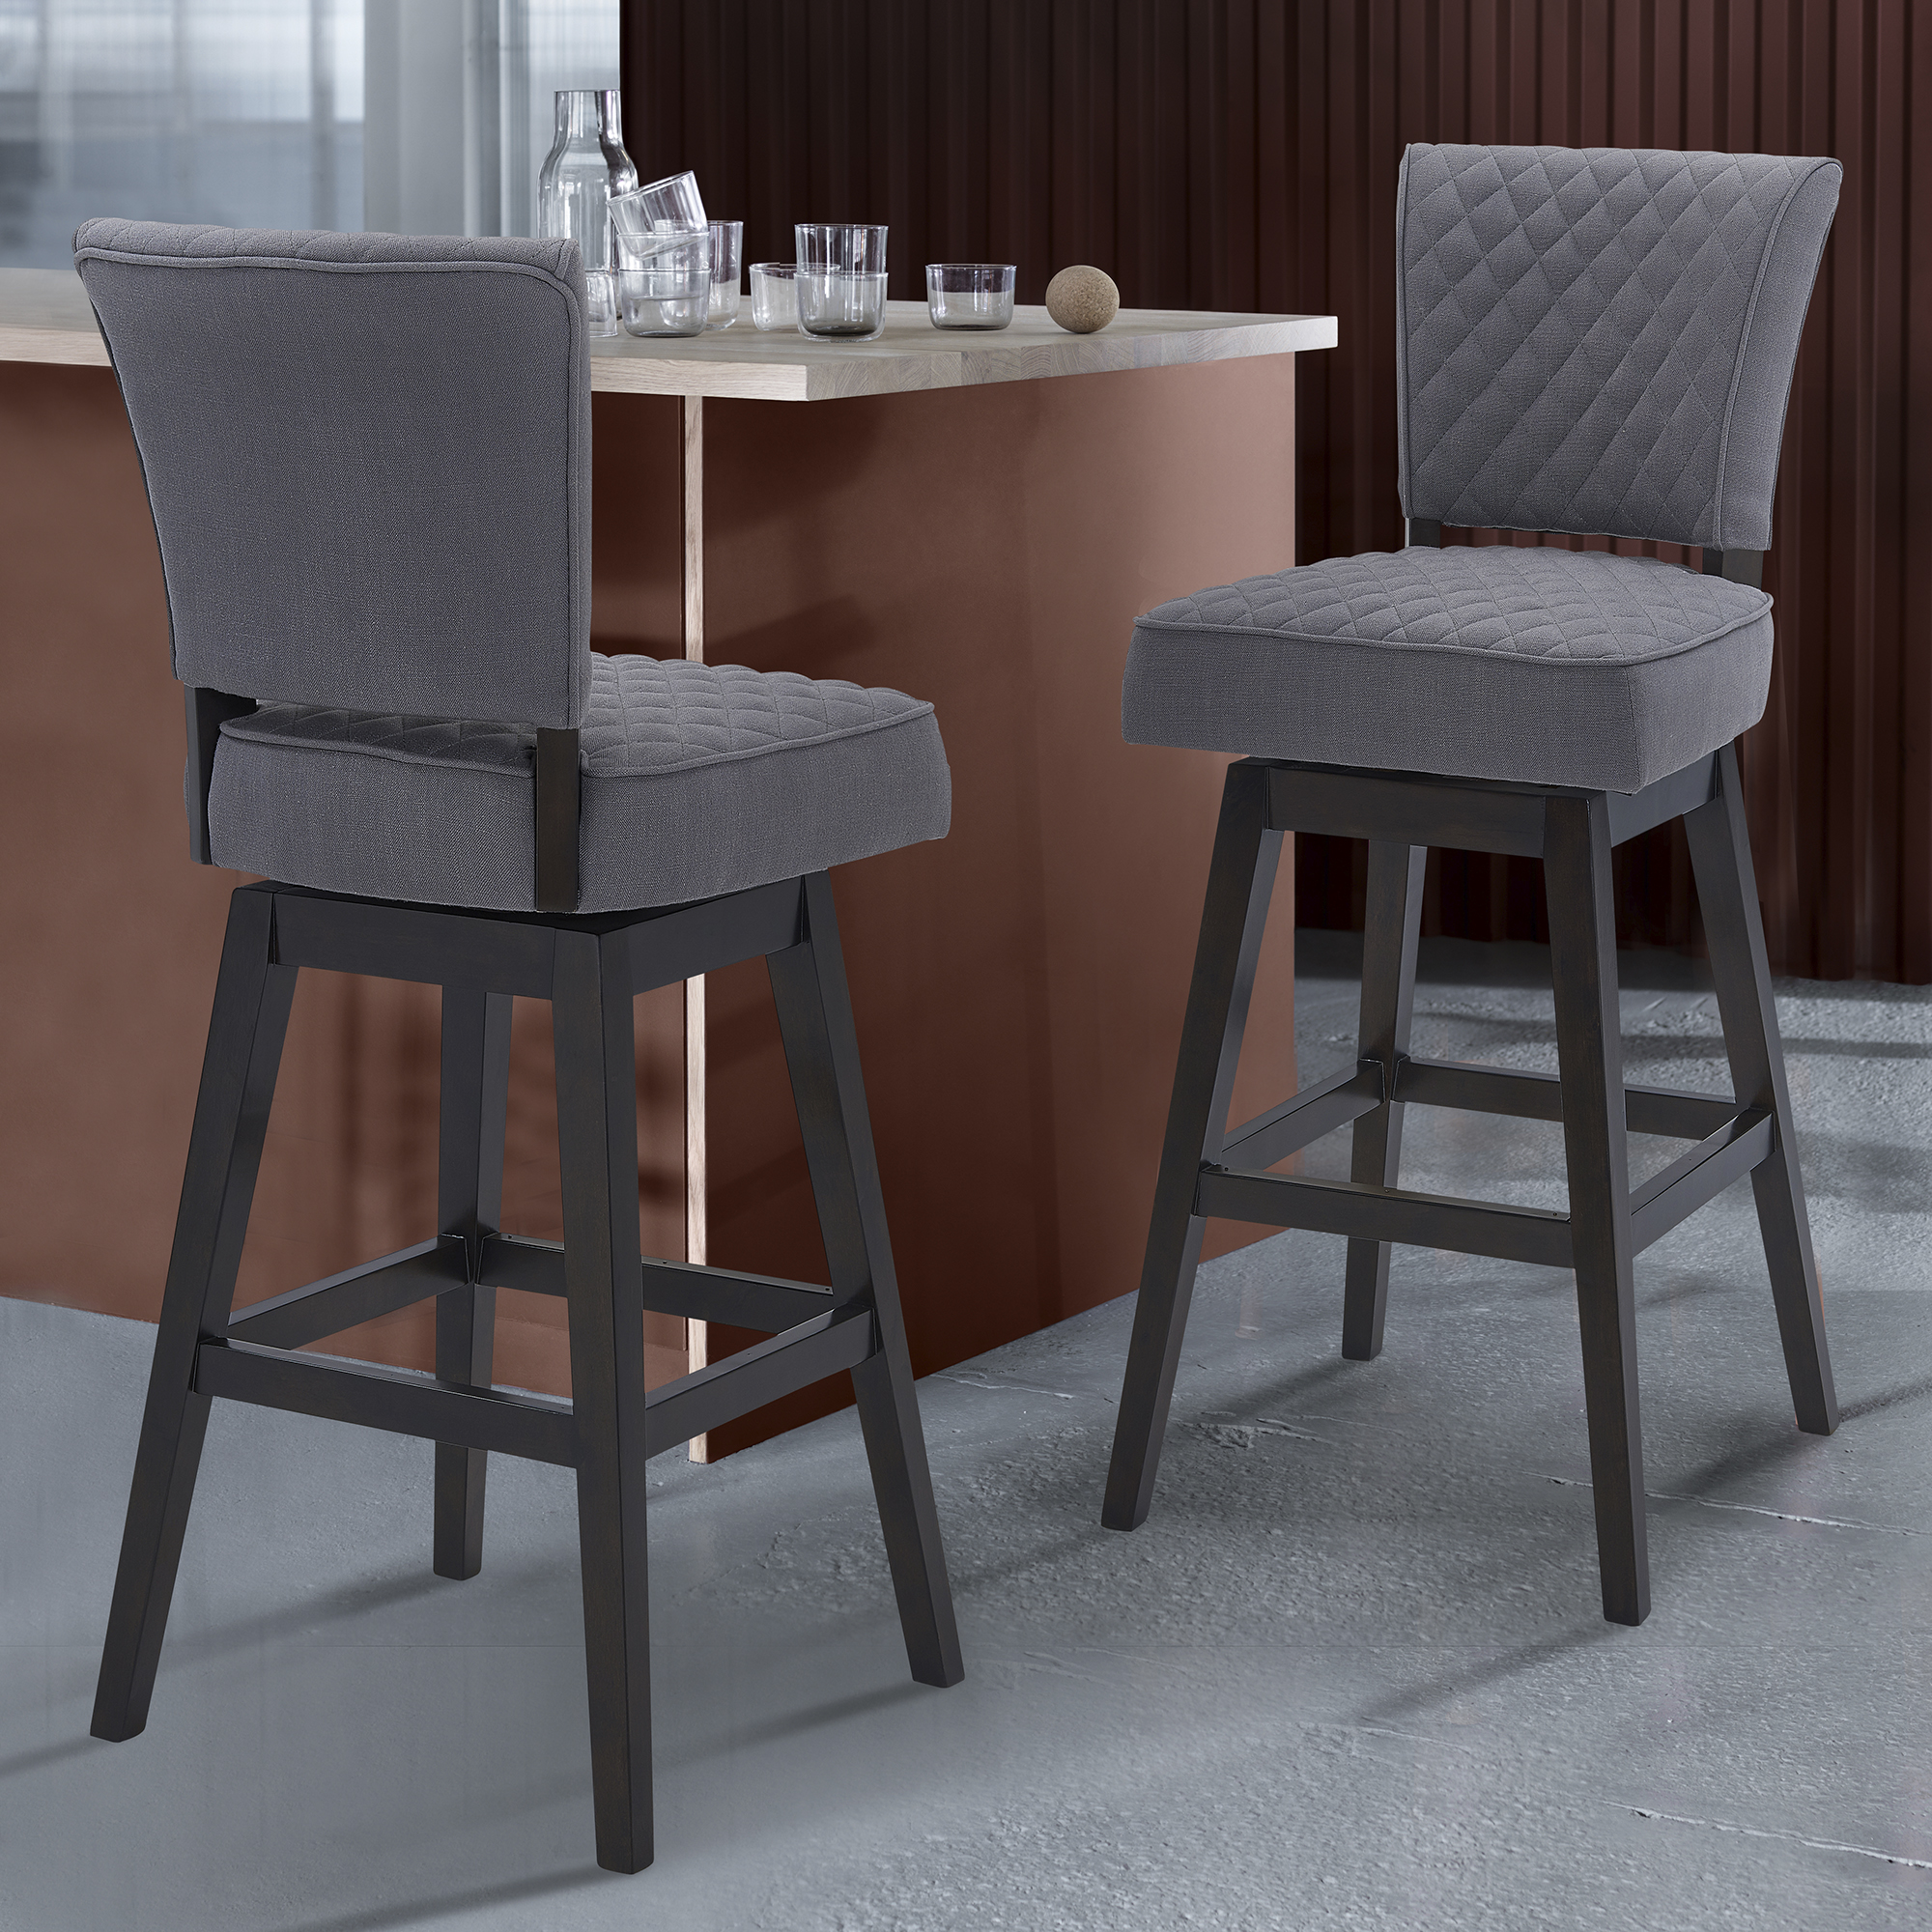 Dearborn 30 Bar Height Wood Swivel Tufted Barstool In Espresso Finish With Grey Fabric Walmart Com Walmart Com